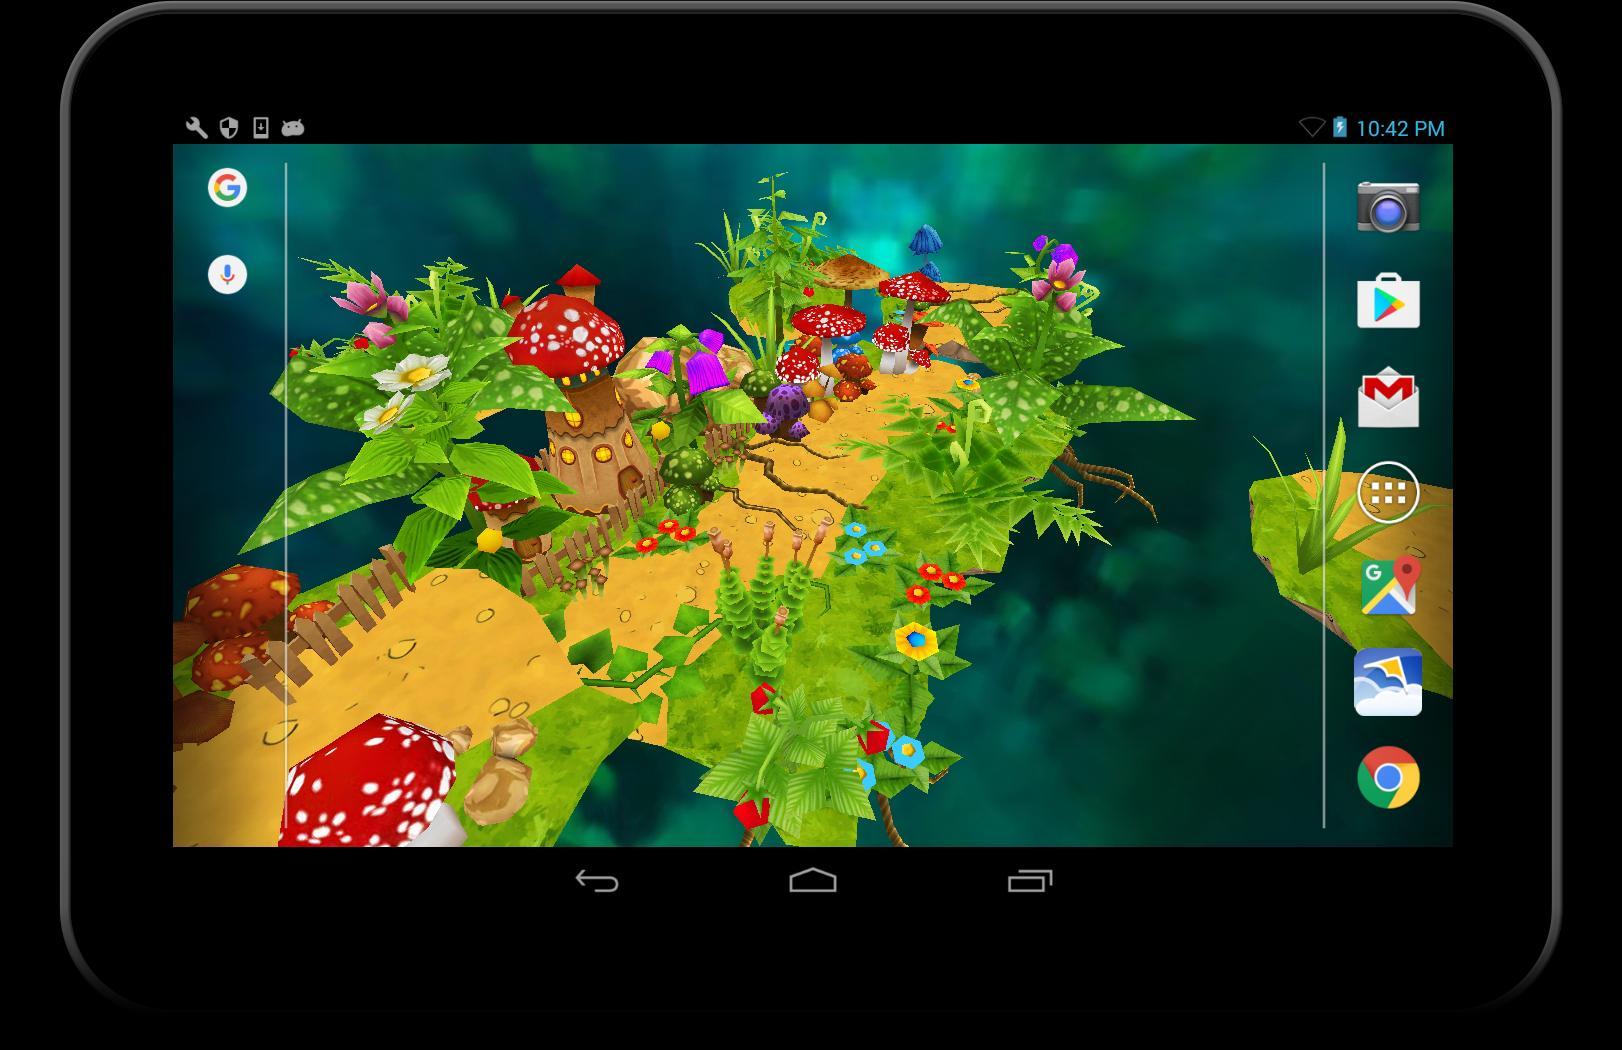 3d Kartun Taman Wallpaper For Android Apk Download